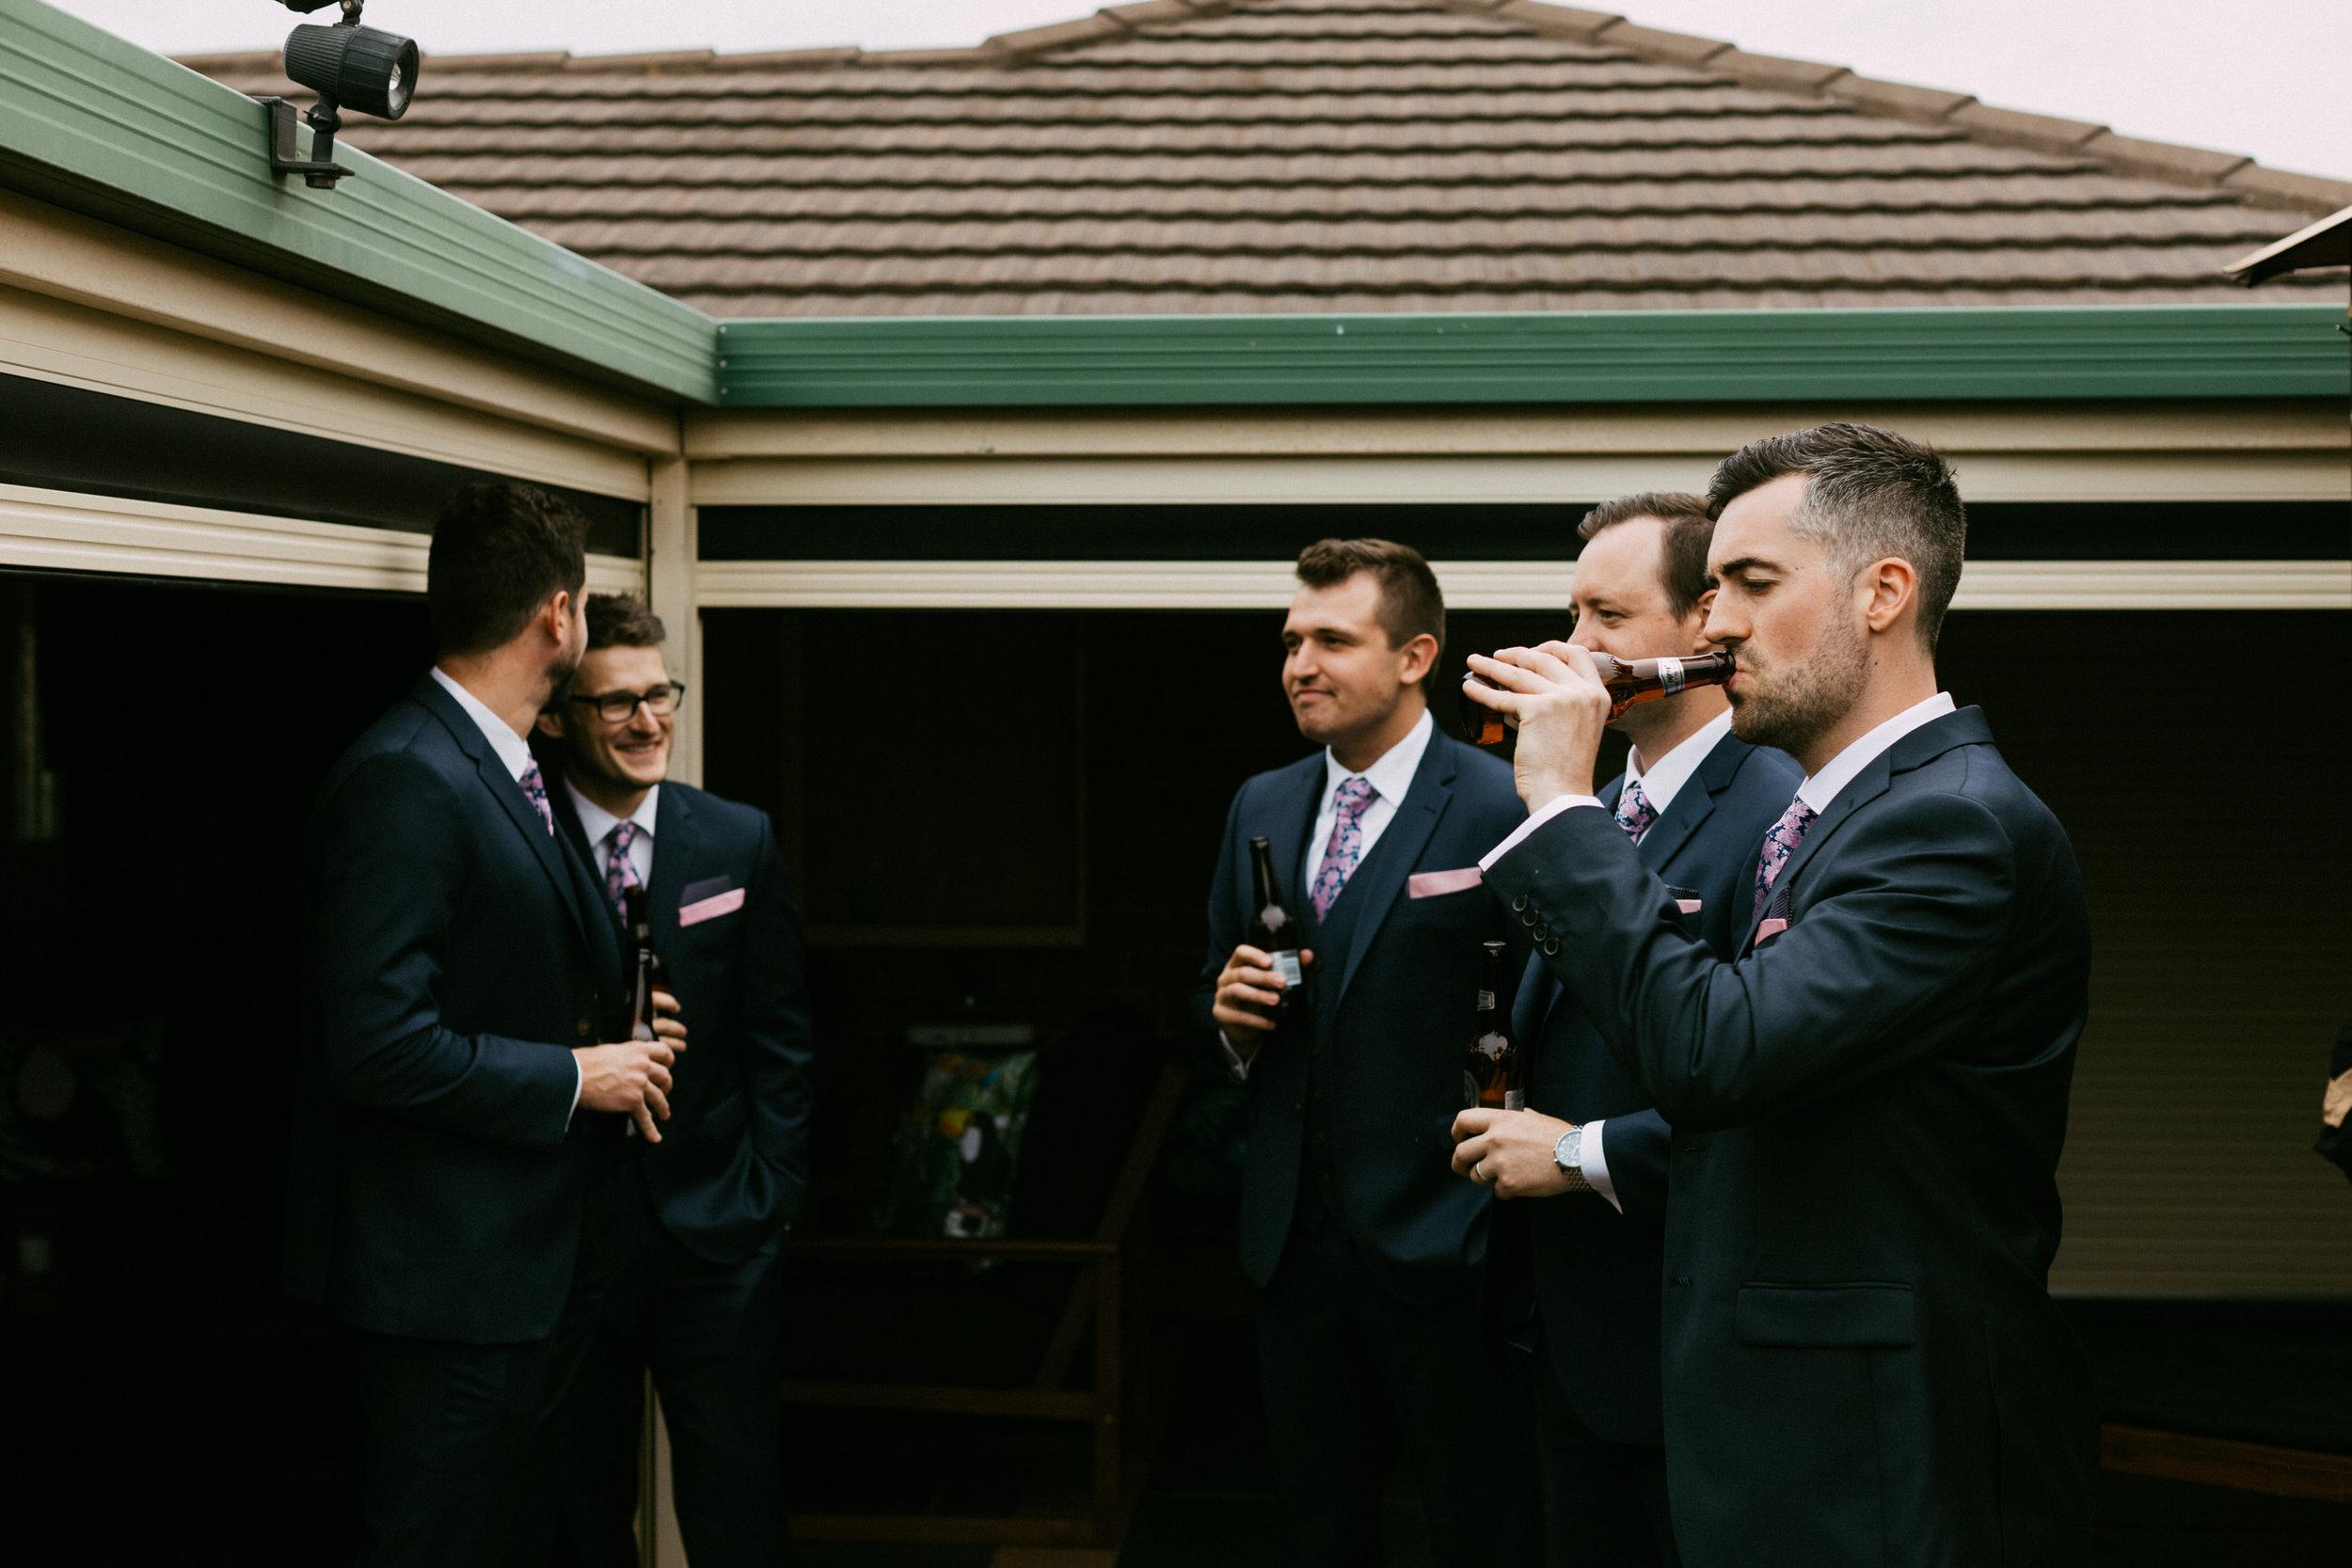 McLaren Vale Adelaide Wedding 001.jpg